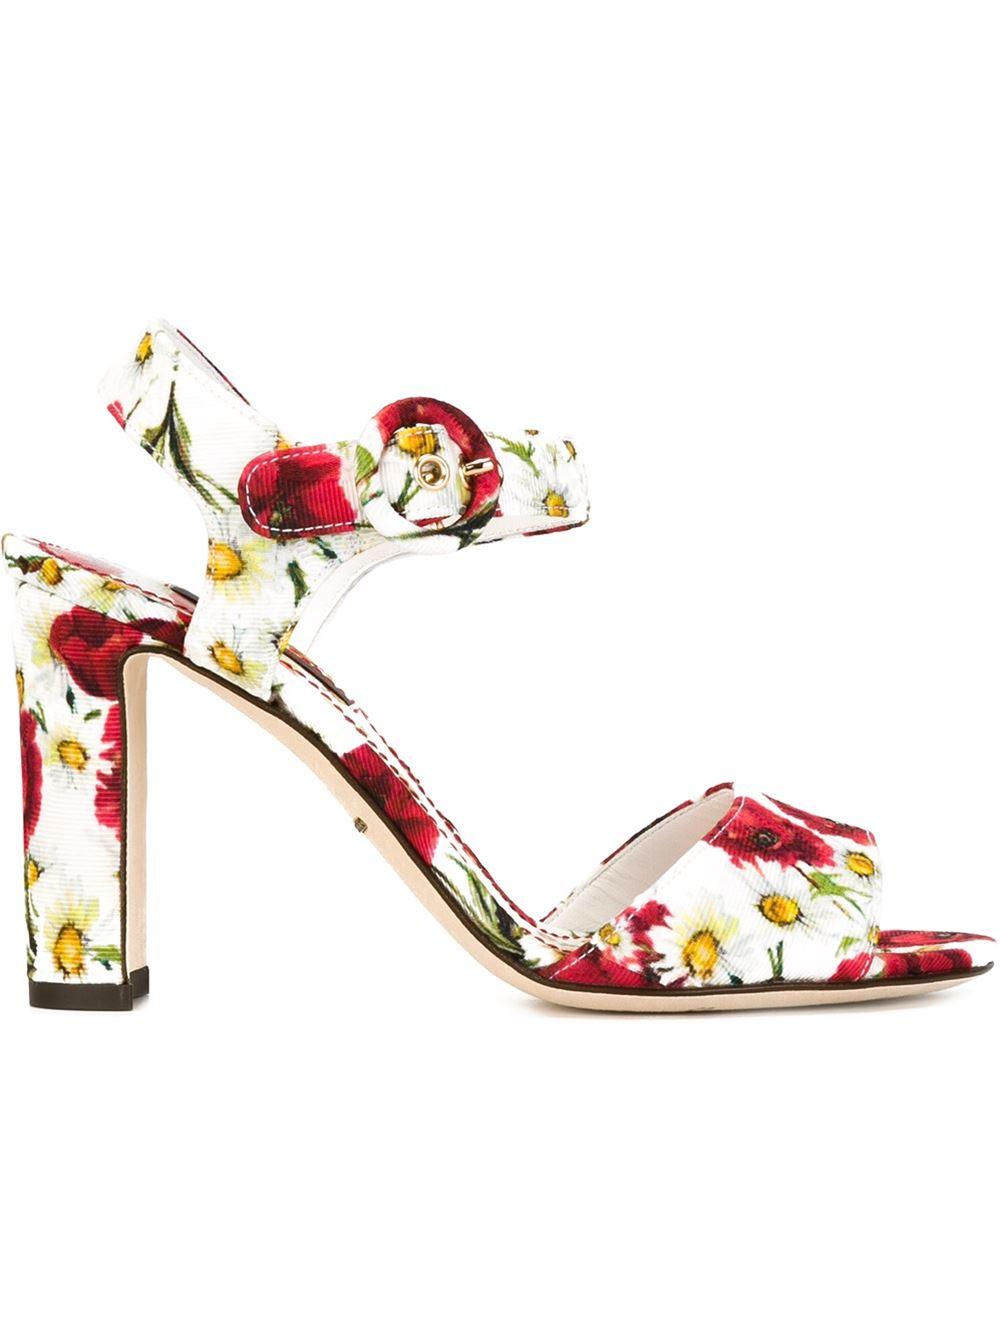 ebay cheap online Dolce & Gabbana 2016 Poppy Printed Sandals sale wide range of u5PdLSIv